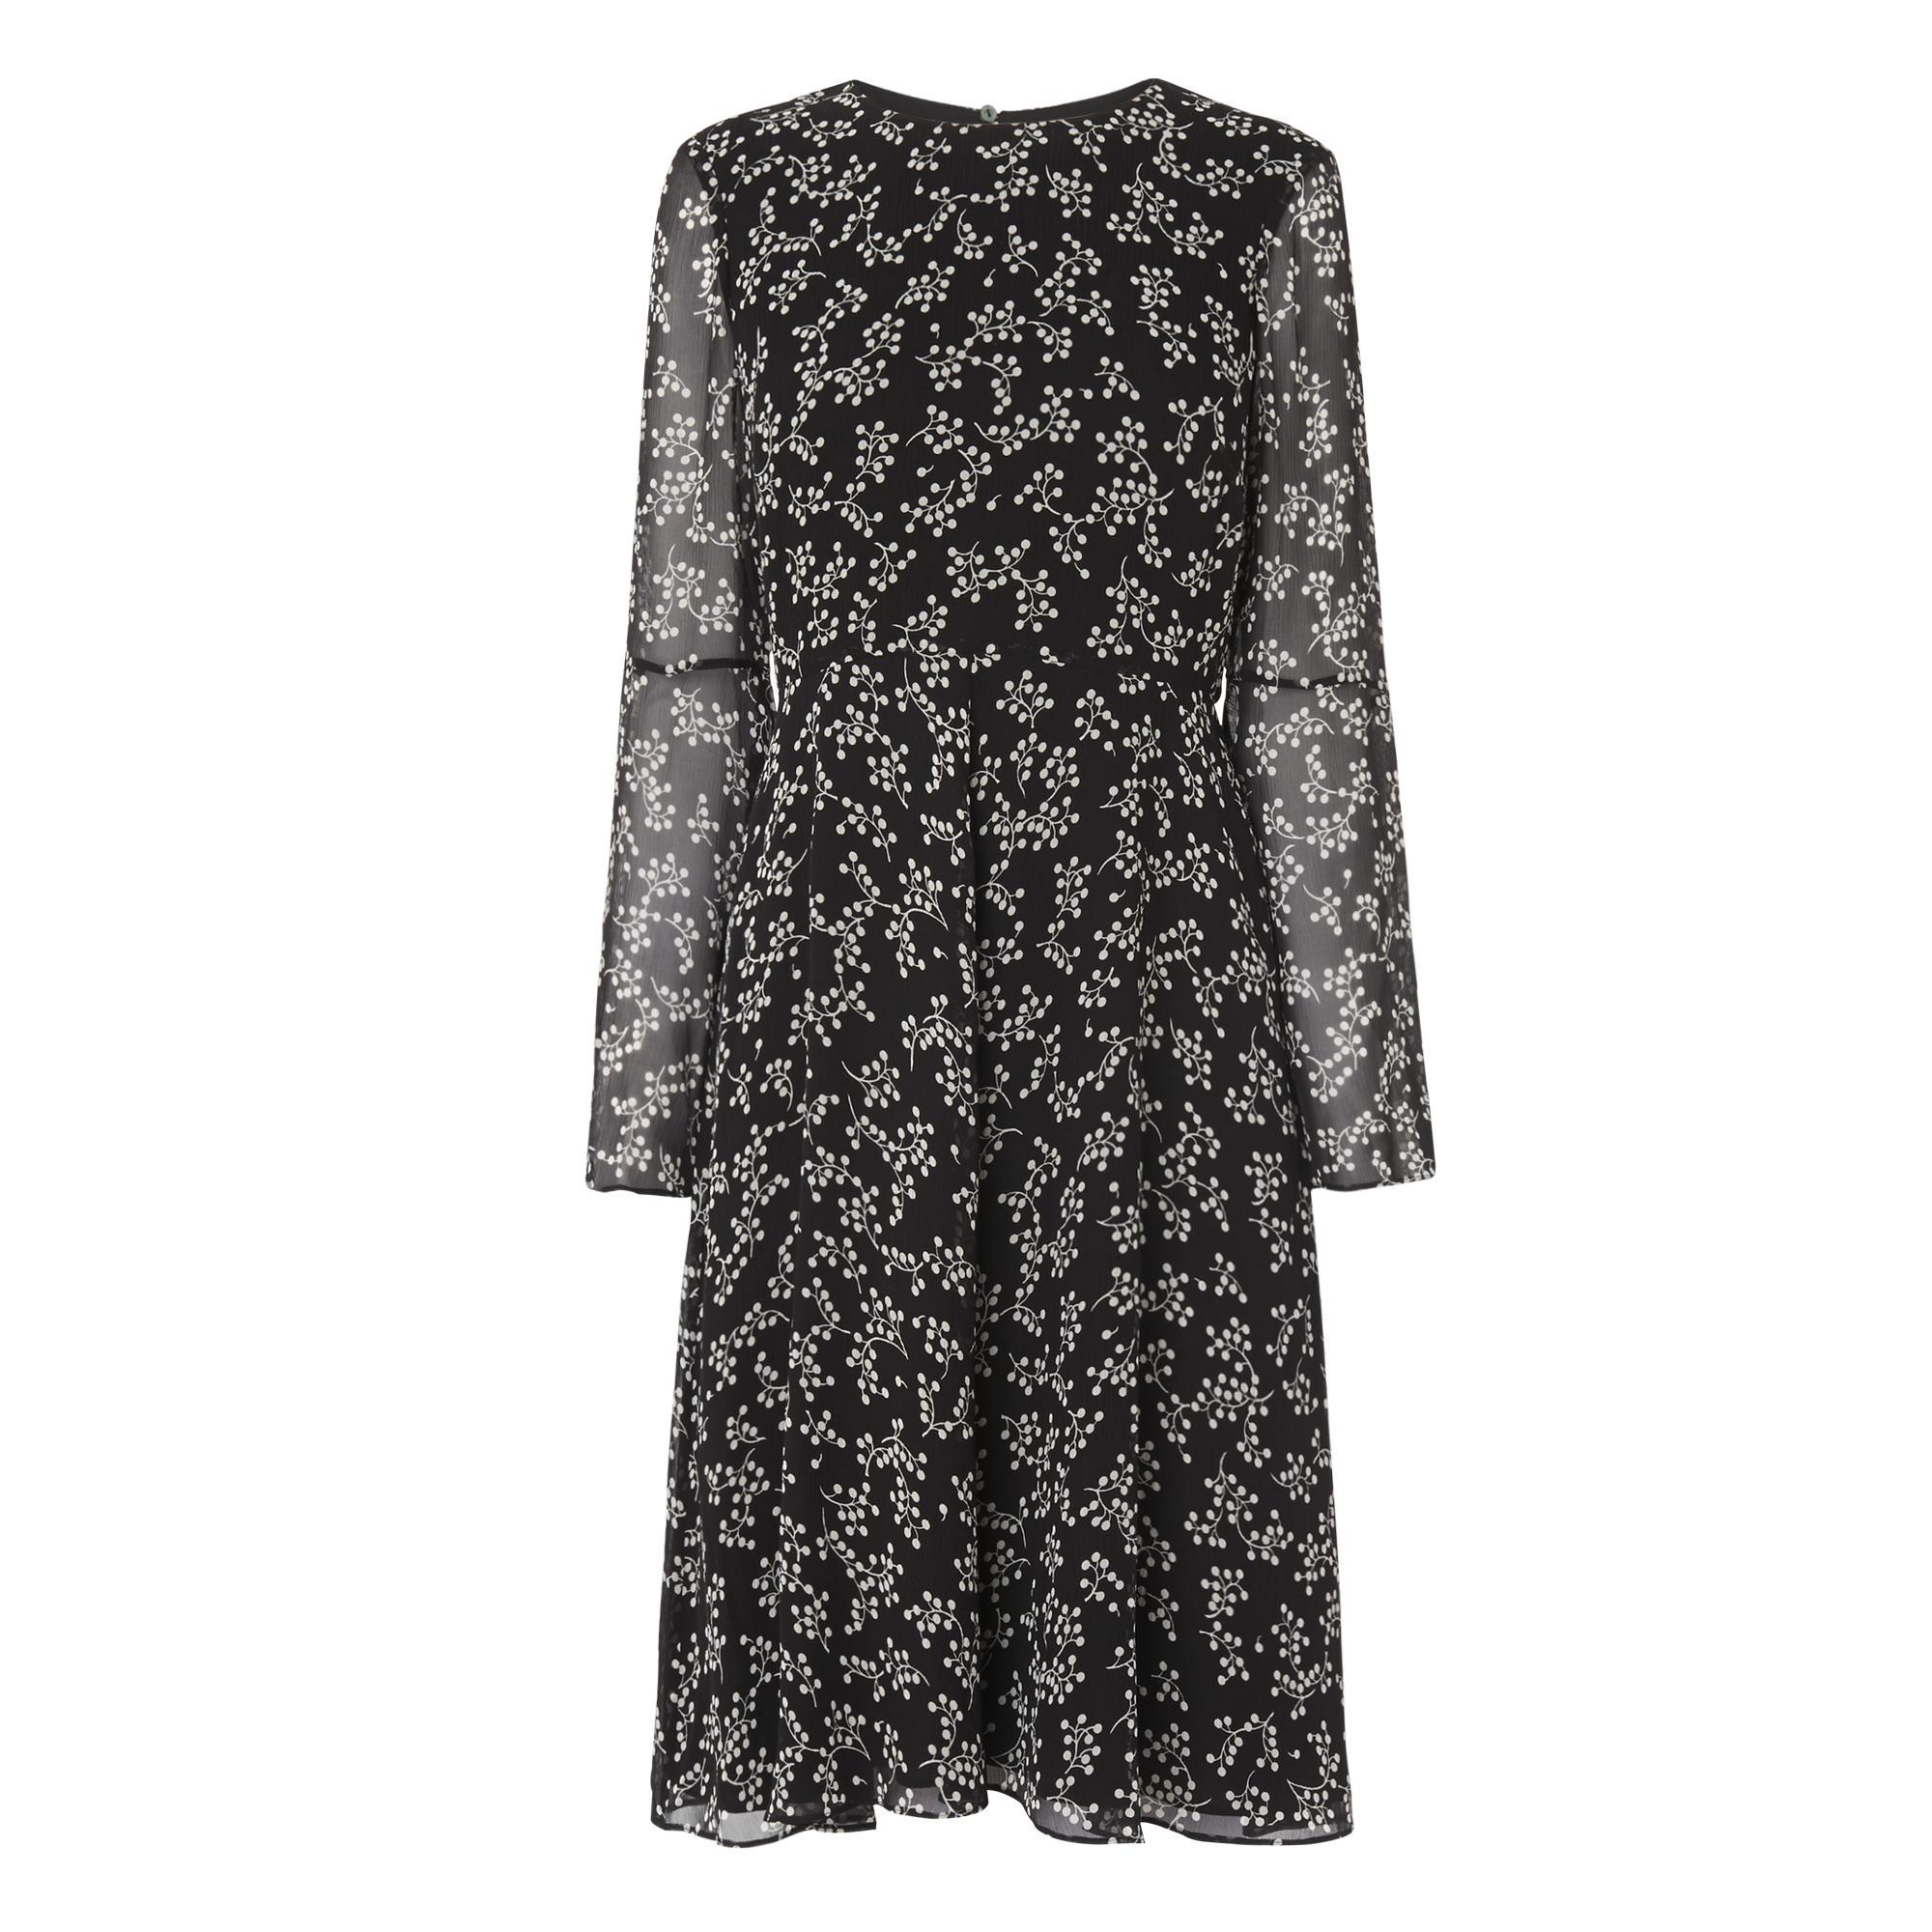 Cecily Black Floral Print Dress